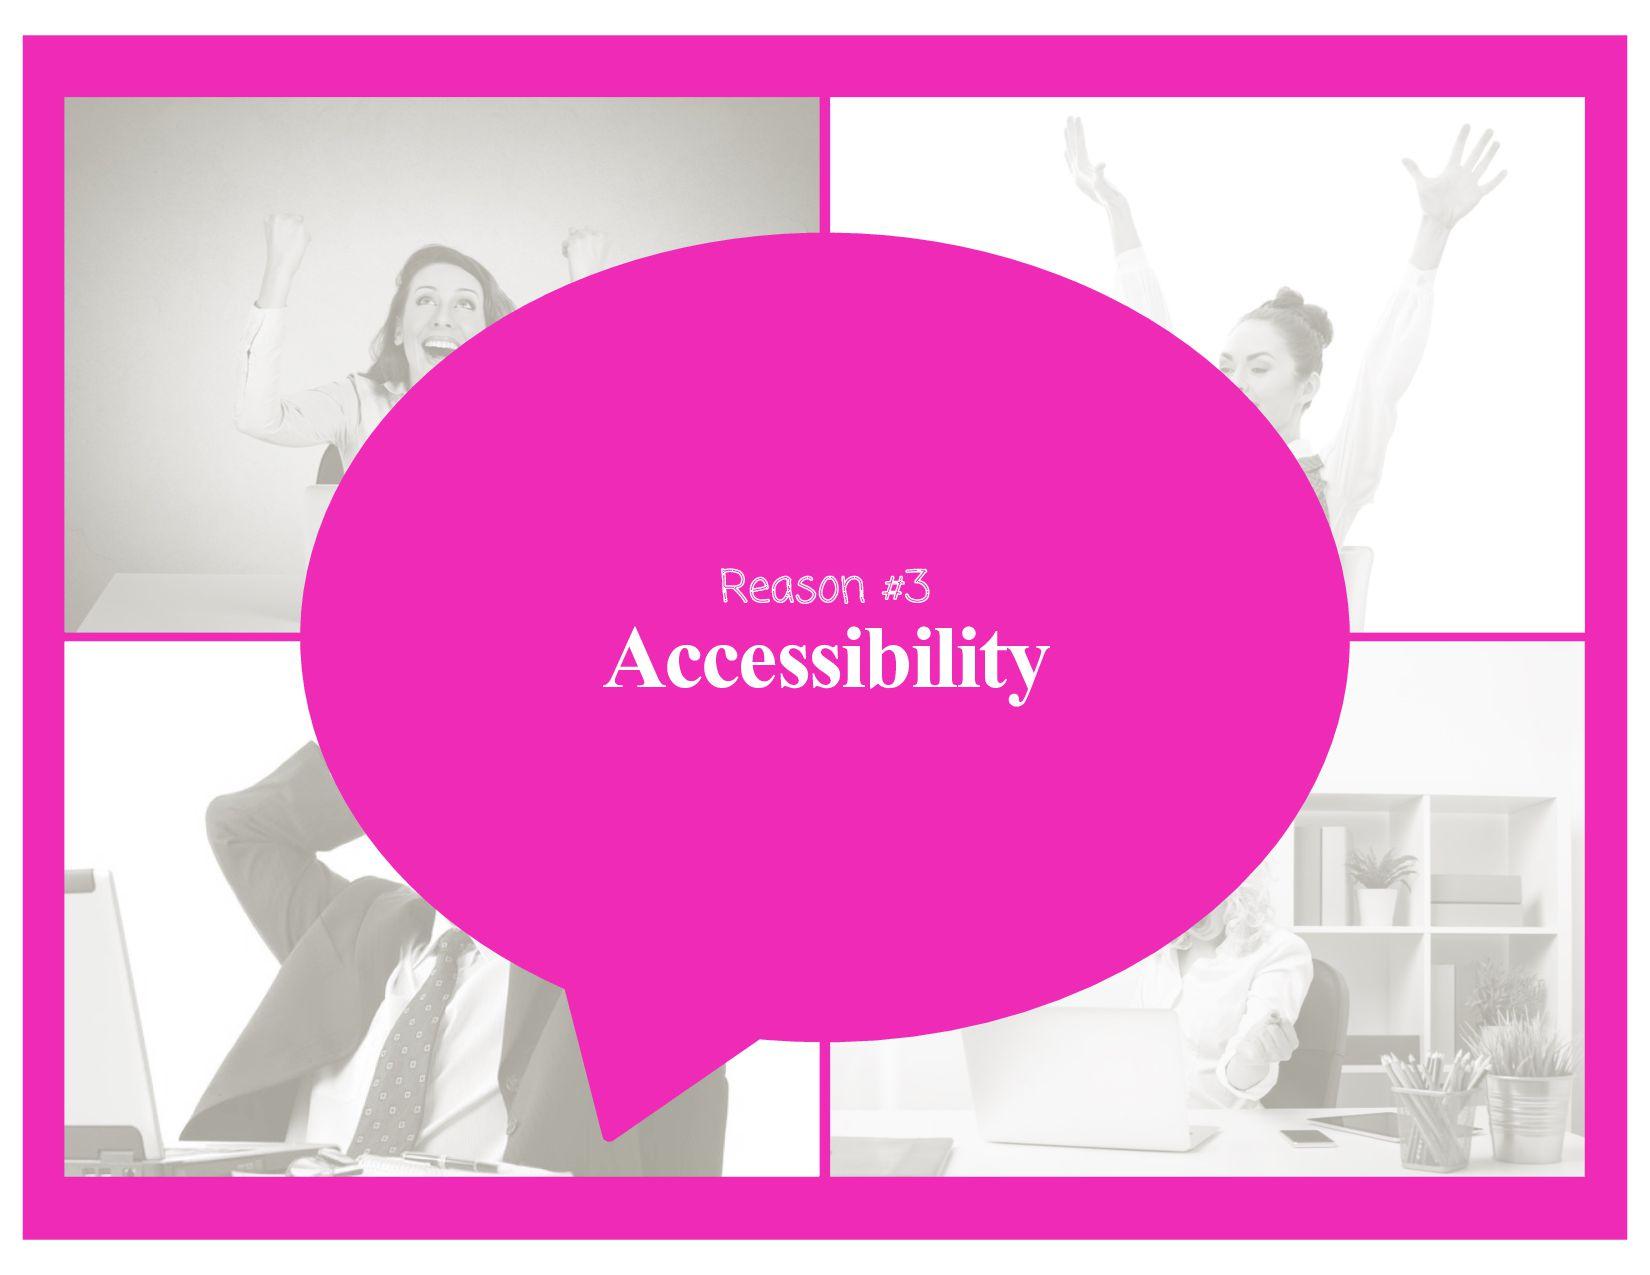 Reason #3 Accessibility